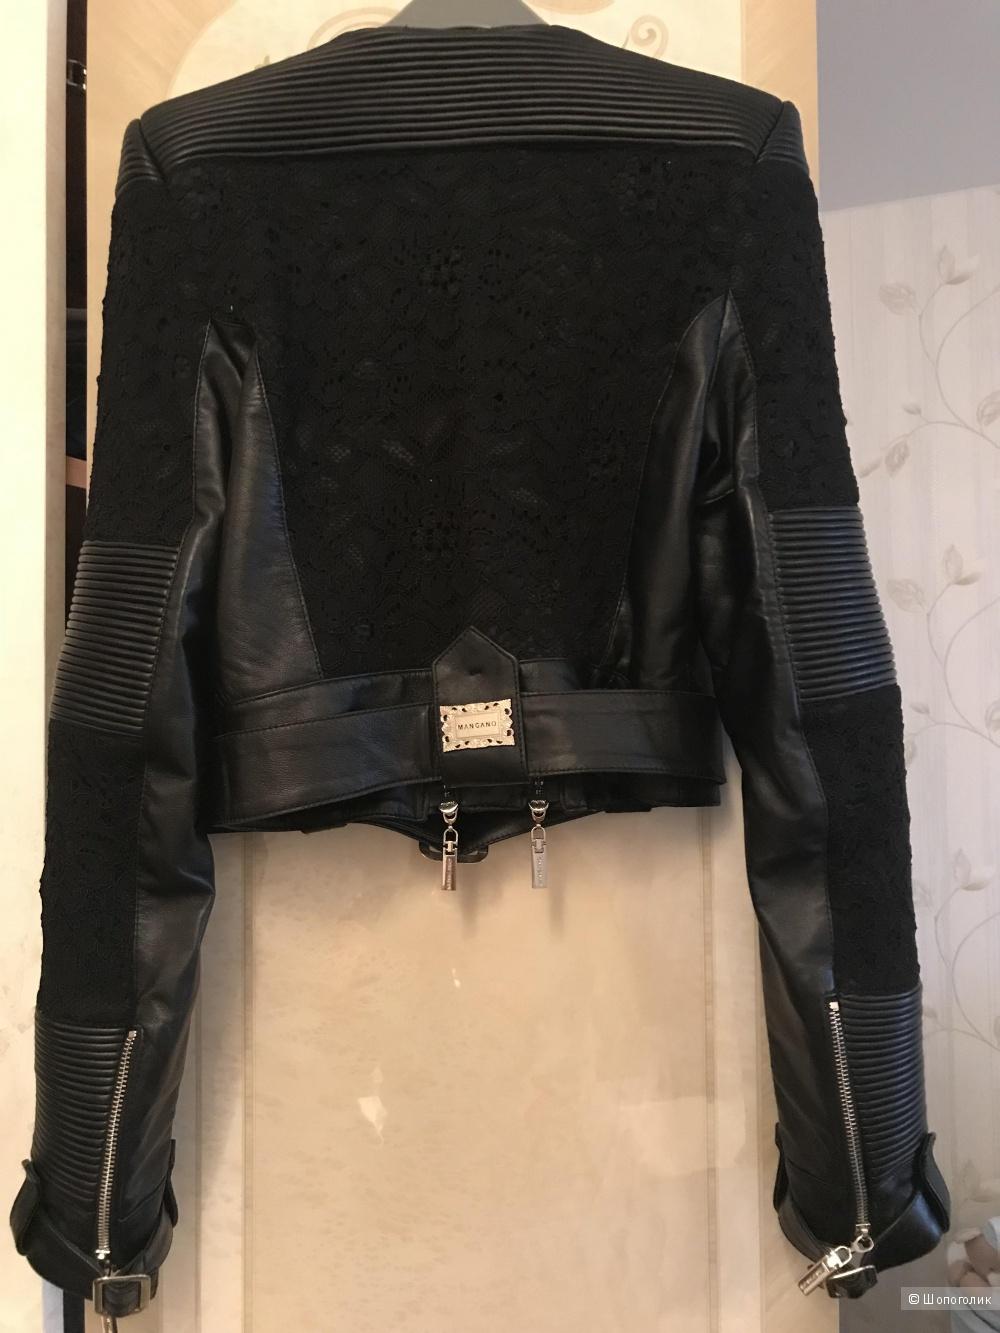 Кожаная куртка Mangano,размер it 42, подойдёт на 42-44.